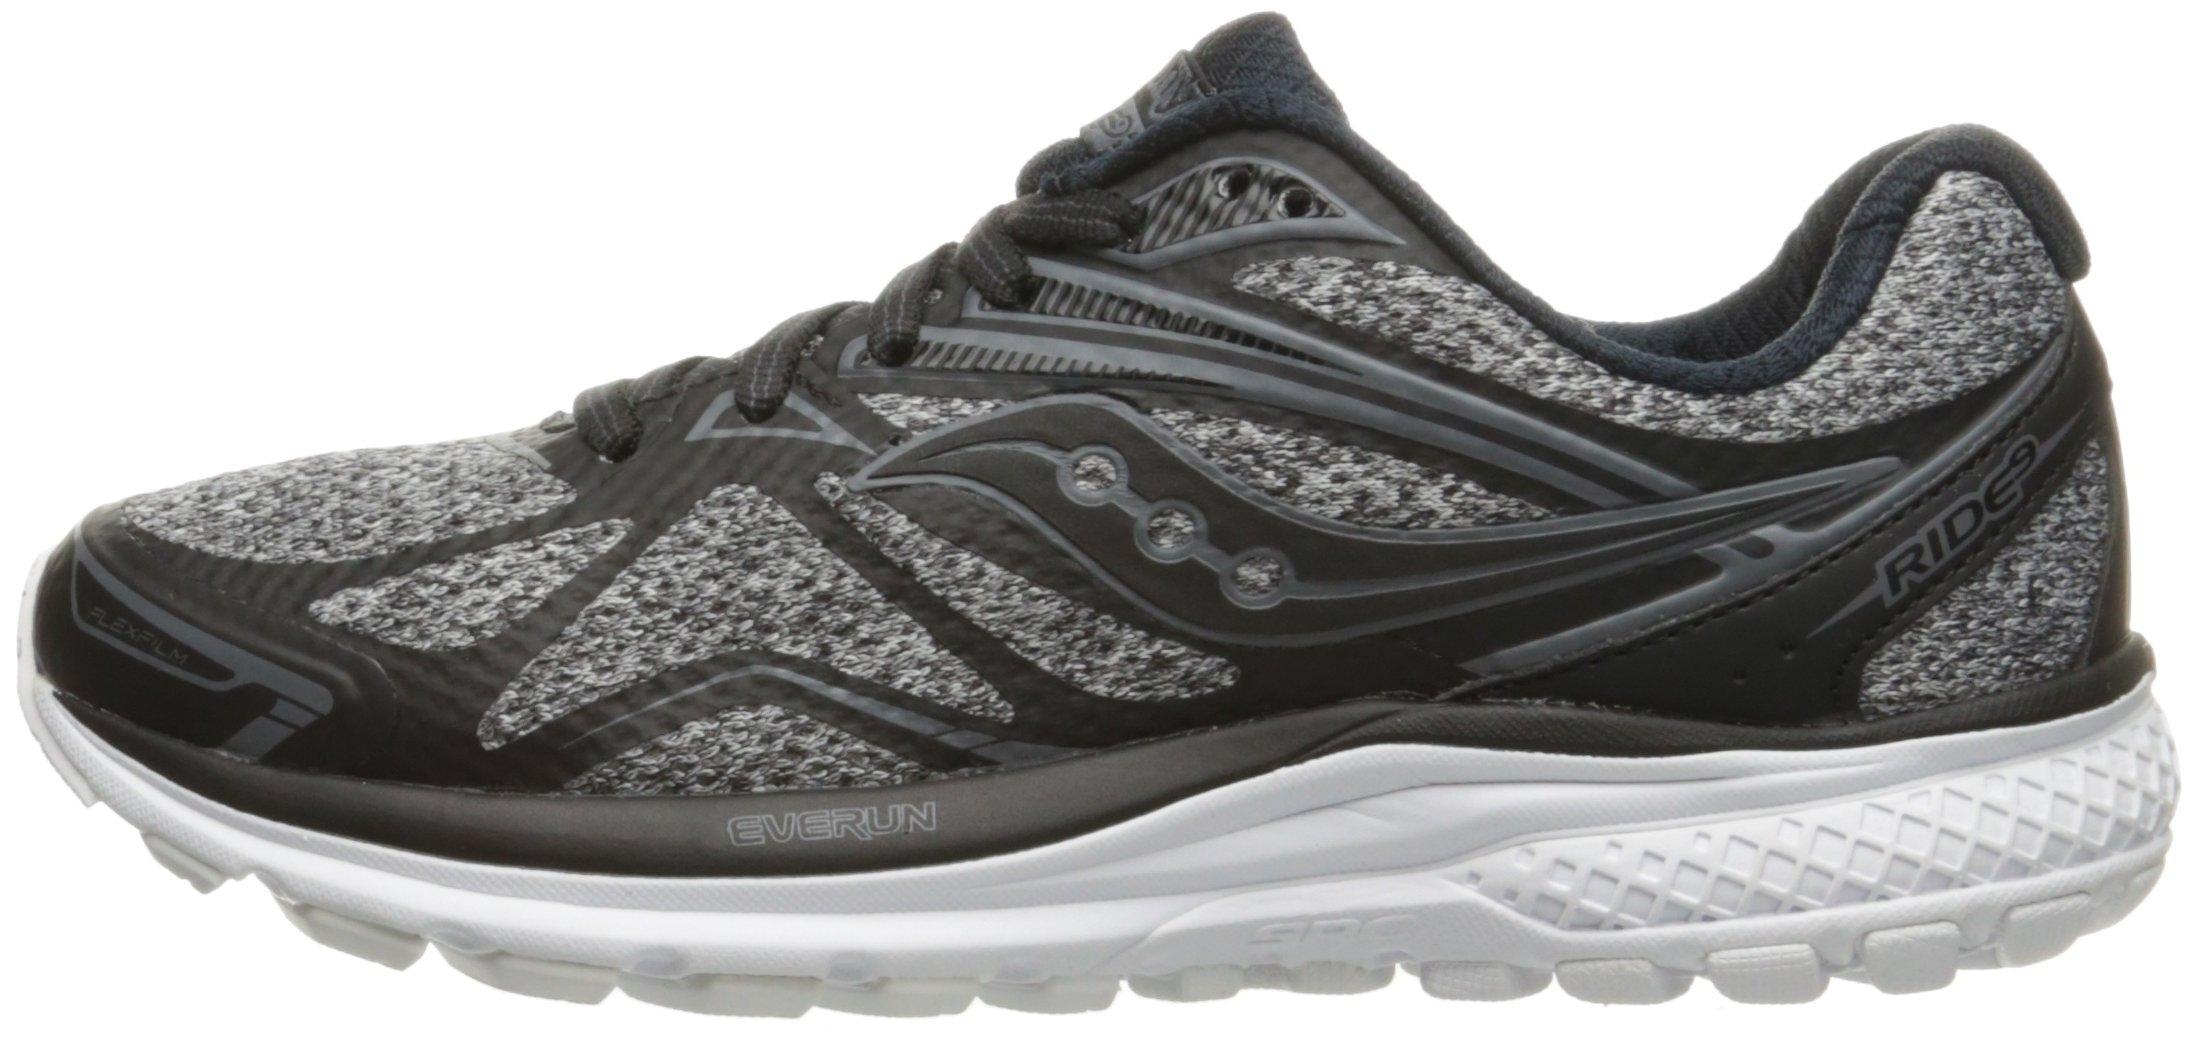 71ghhLkhiNL - Saucony Women's Ride 9 Lr Running Shoe, Grey/Black, 5 M US